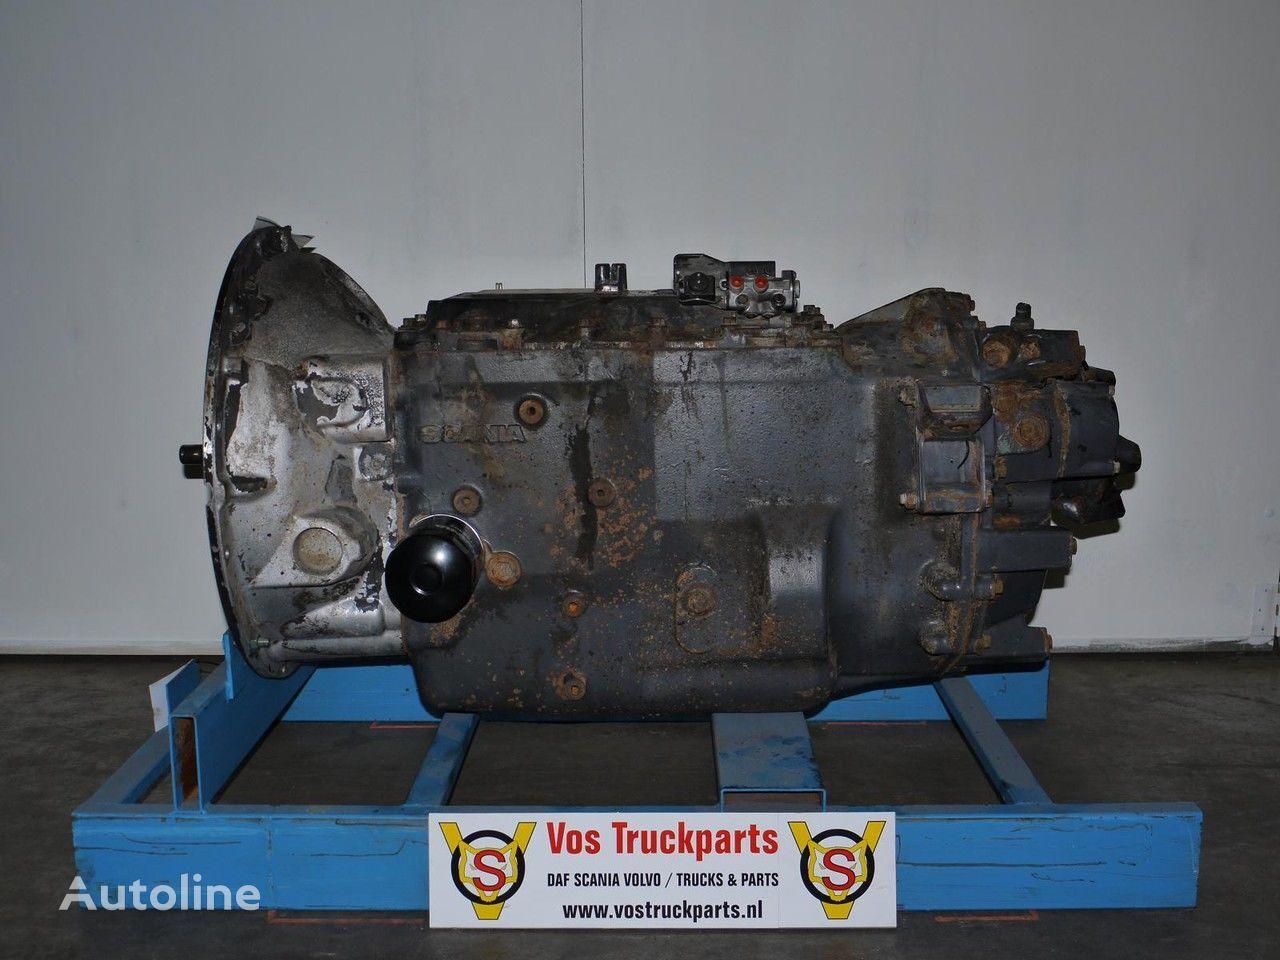 SCANIA Z SC-3 GRS-900 E gearbox for SCANIA Z SC-3 GRS-900 E truck